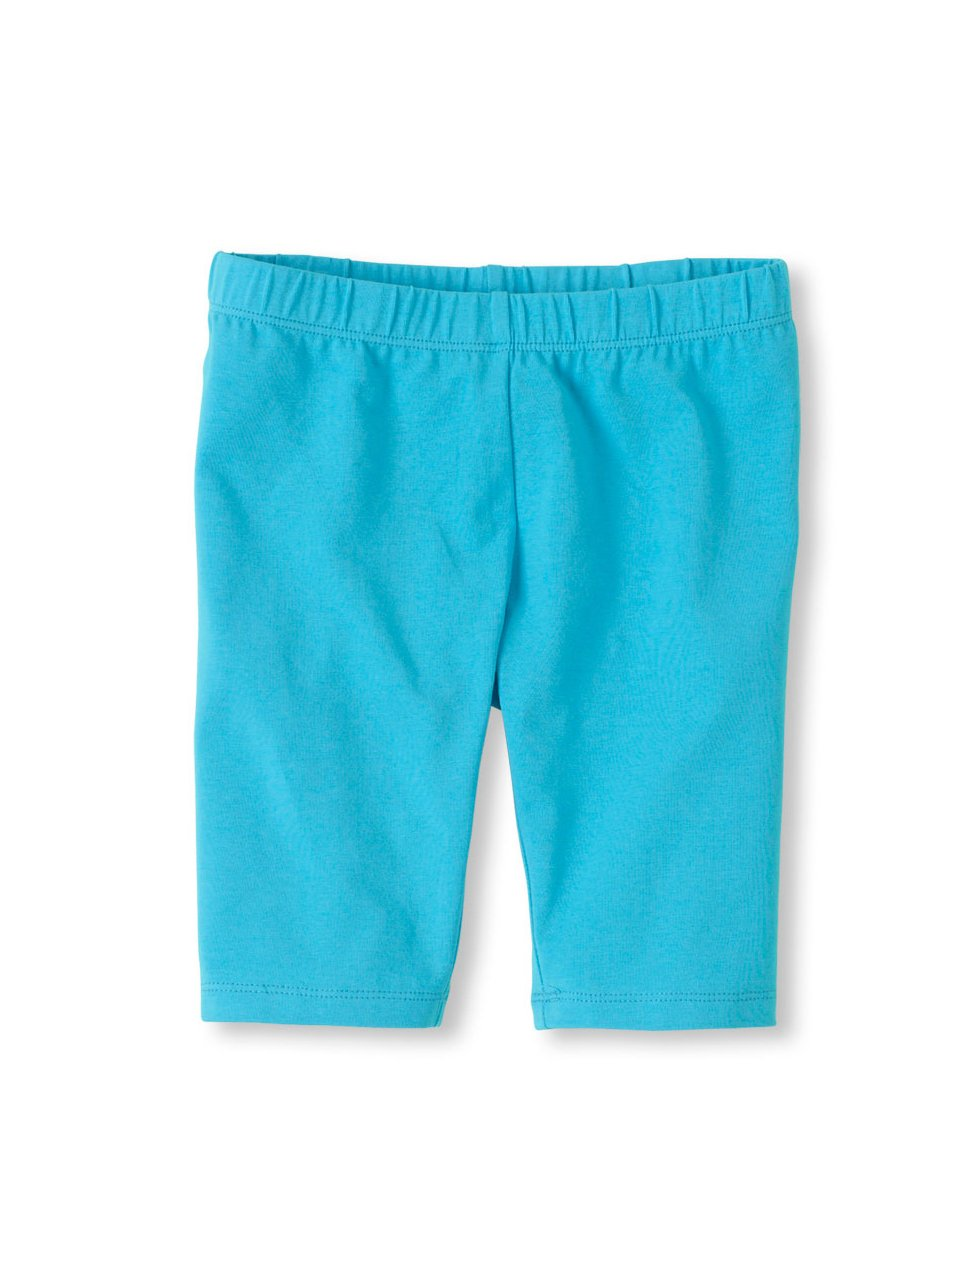 Vivian's Fashions Legging Shorts - Girls, Biker Length, Cotton (Turquoise, Lg) by Vivian's Fashions (Image #1)